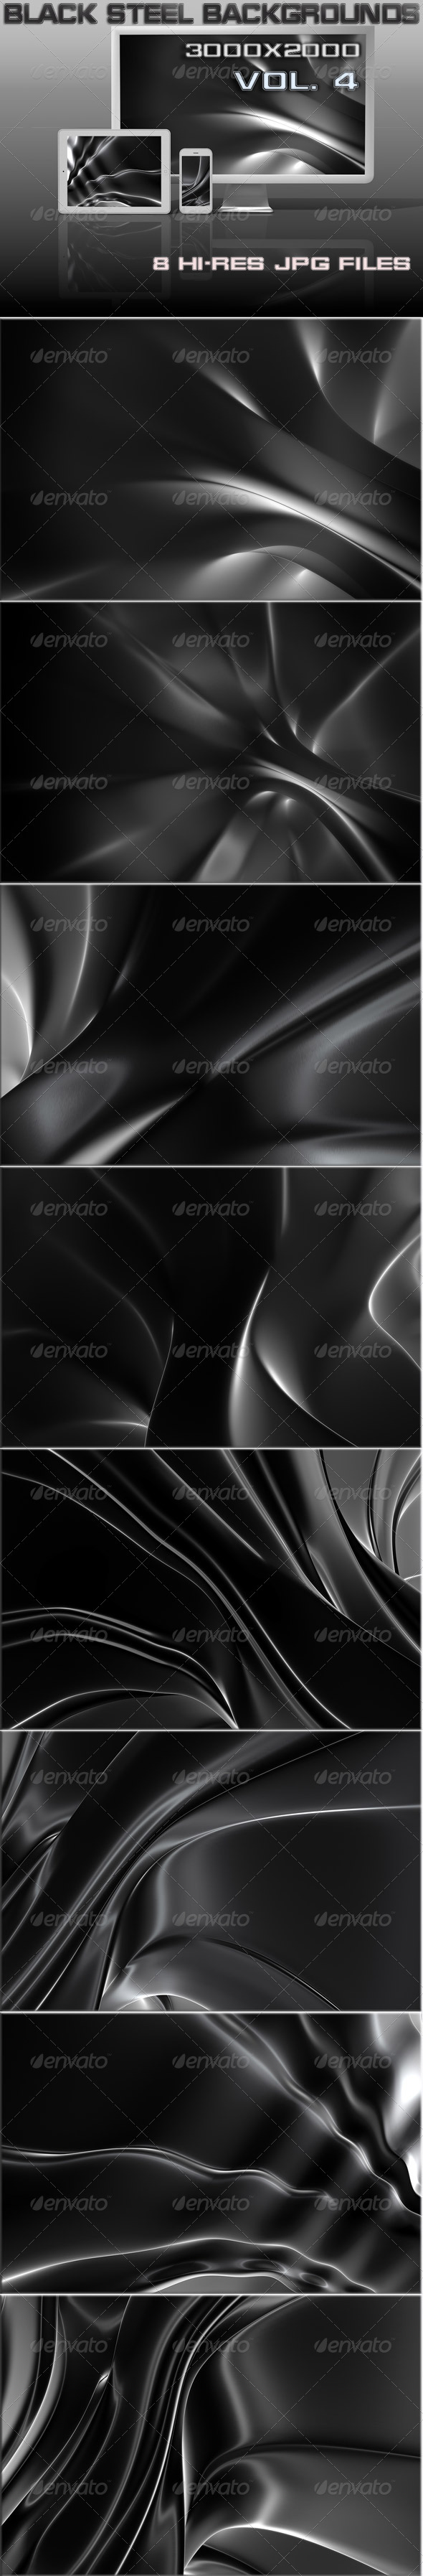 GraphicRiver Black Steel 3D Background 7141320